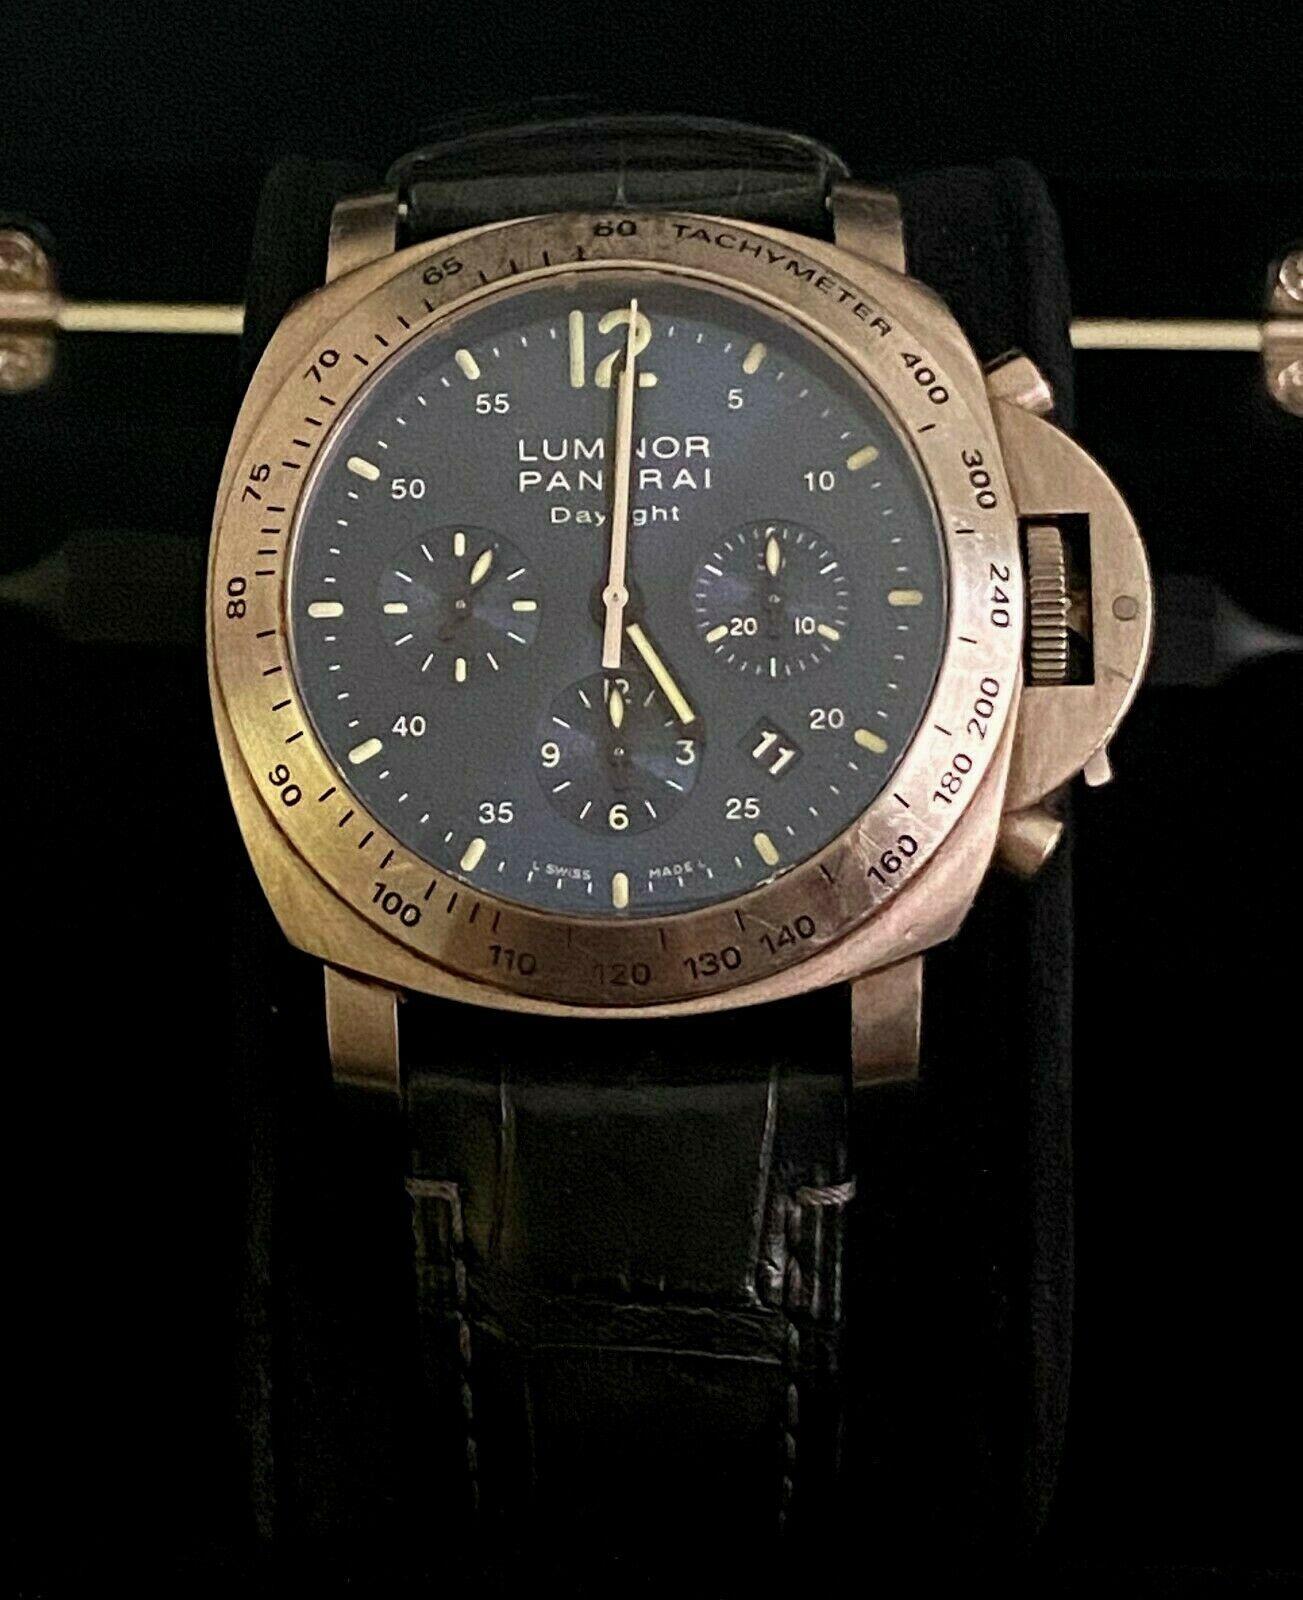 PANERAI Men's Luminor Watch Firenze 1860 Blue Dial Leather Wrist Strap Limited - watch picture 1